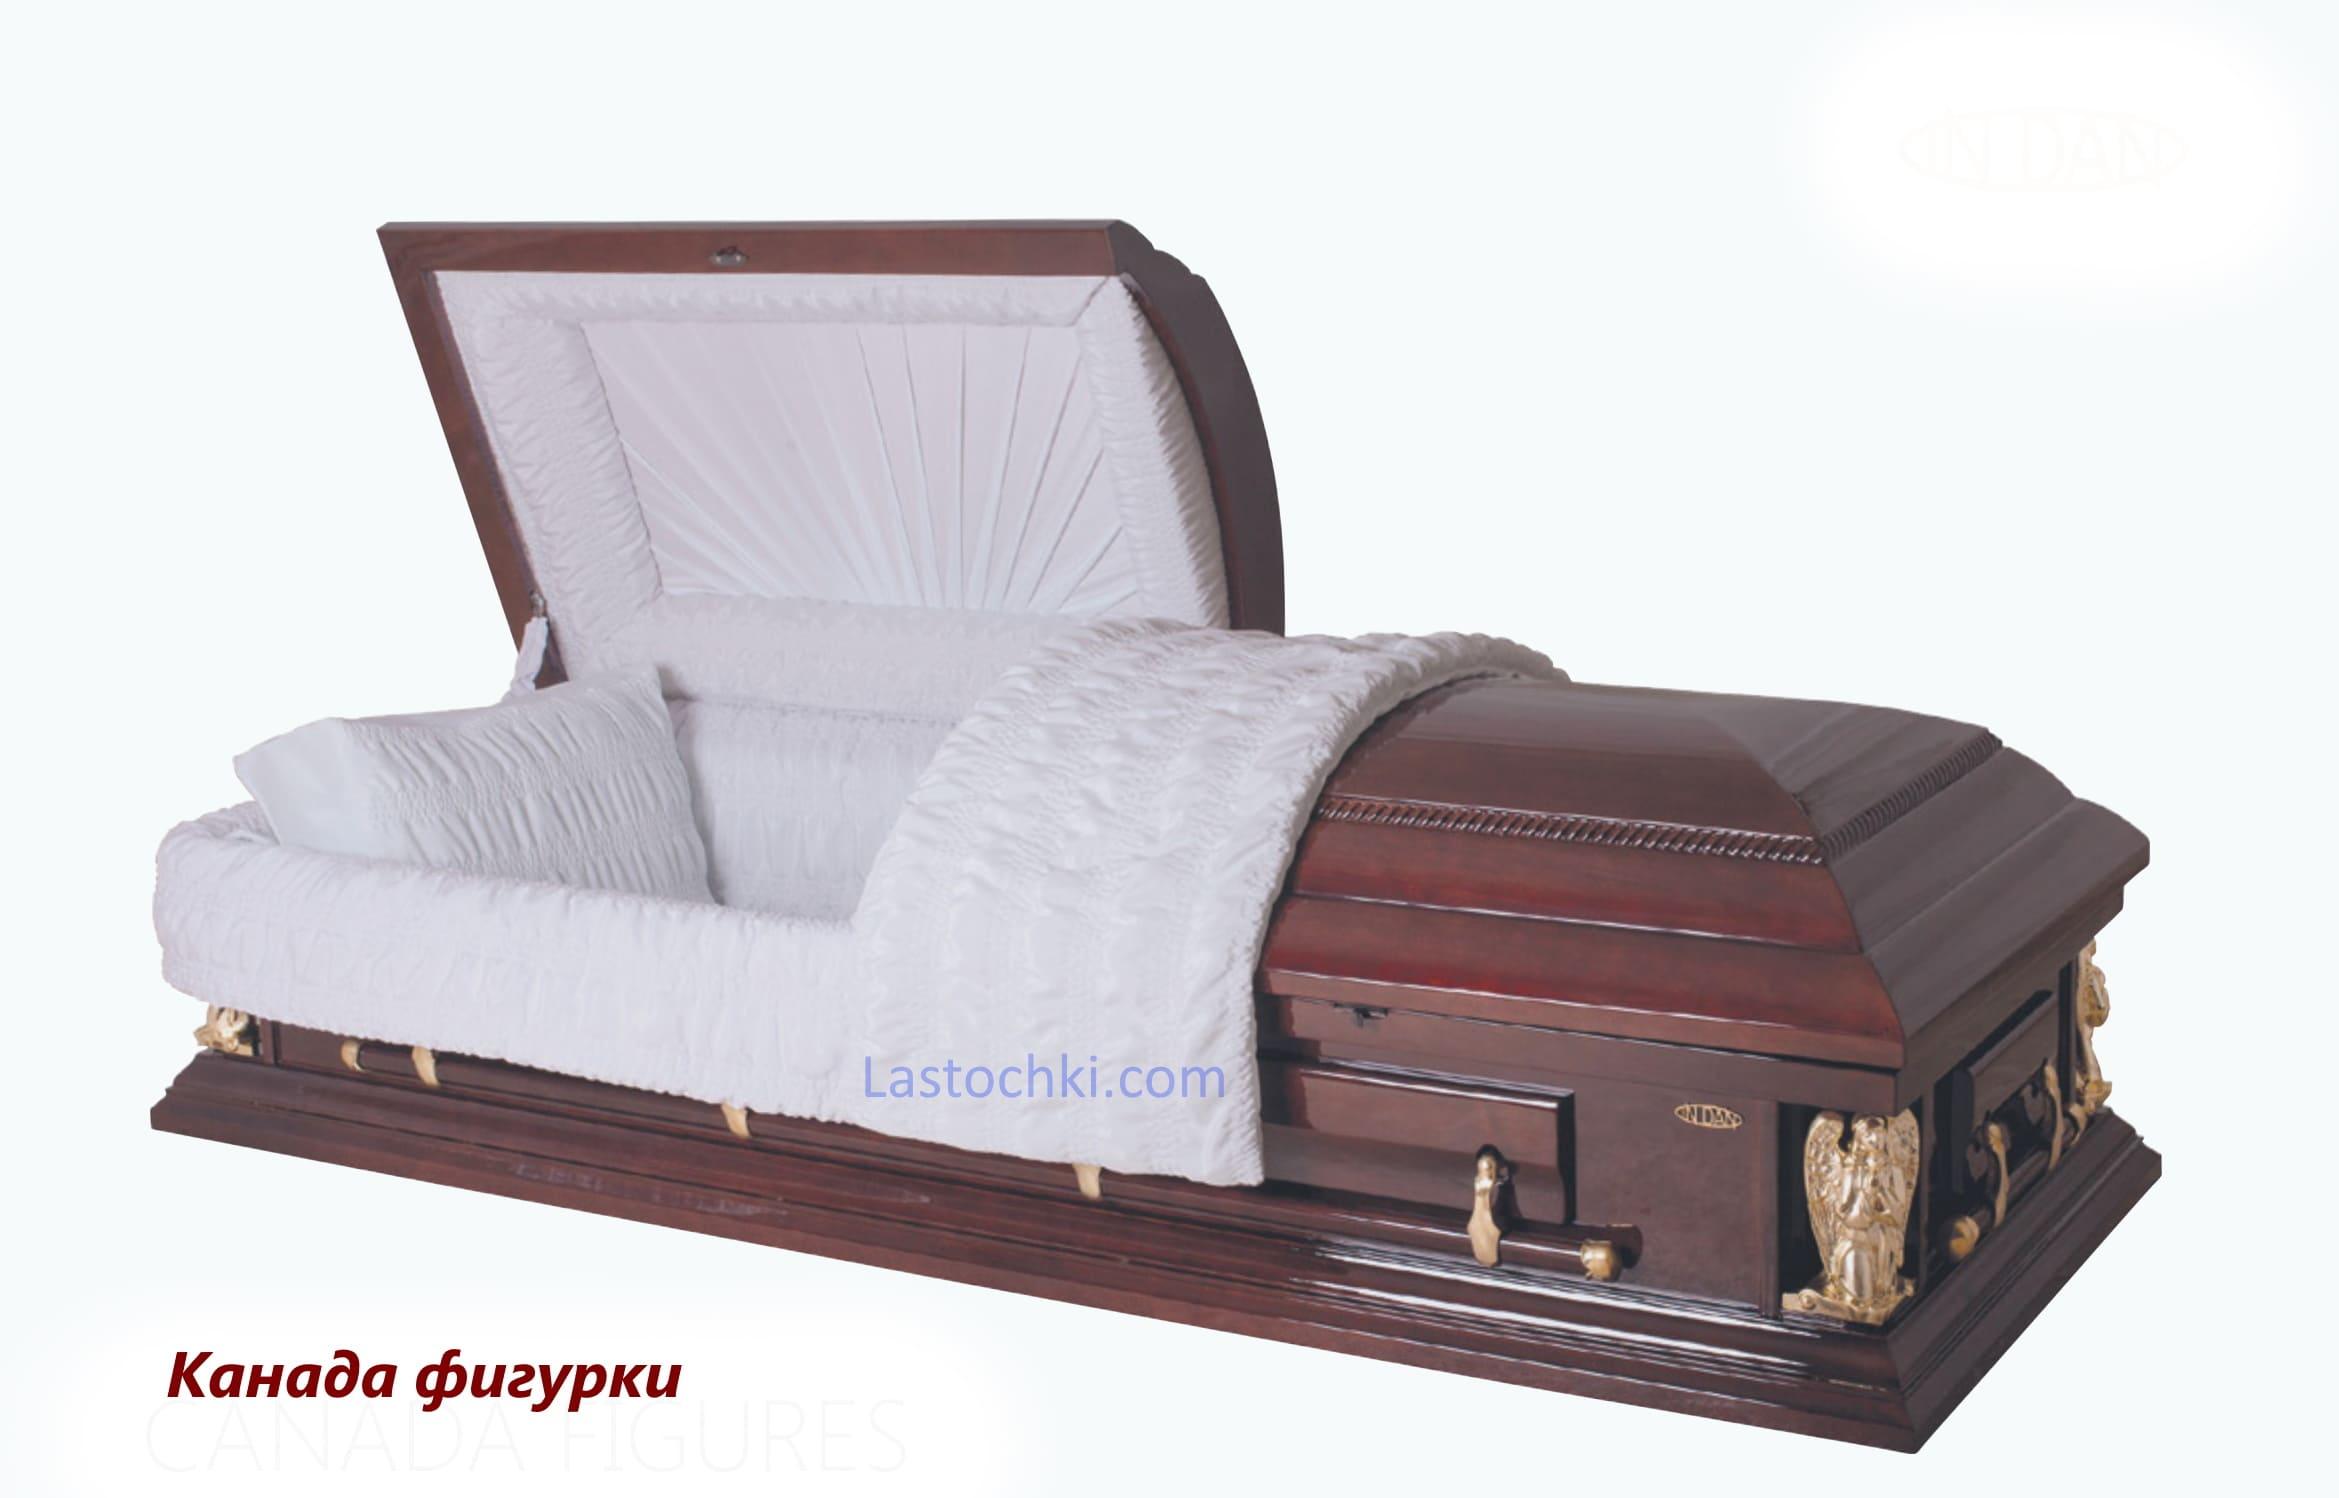 Саркофаг Канада фигурки  -  Цена 70 000 грн.